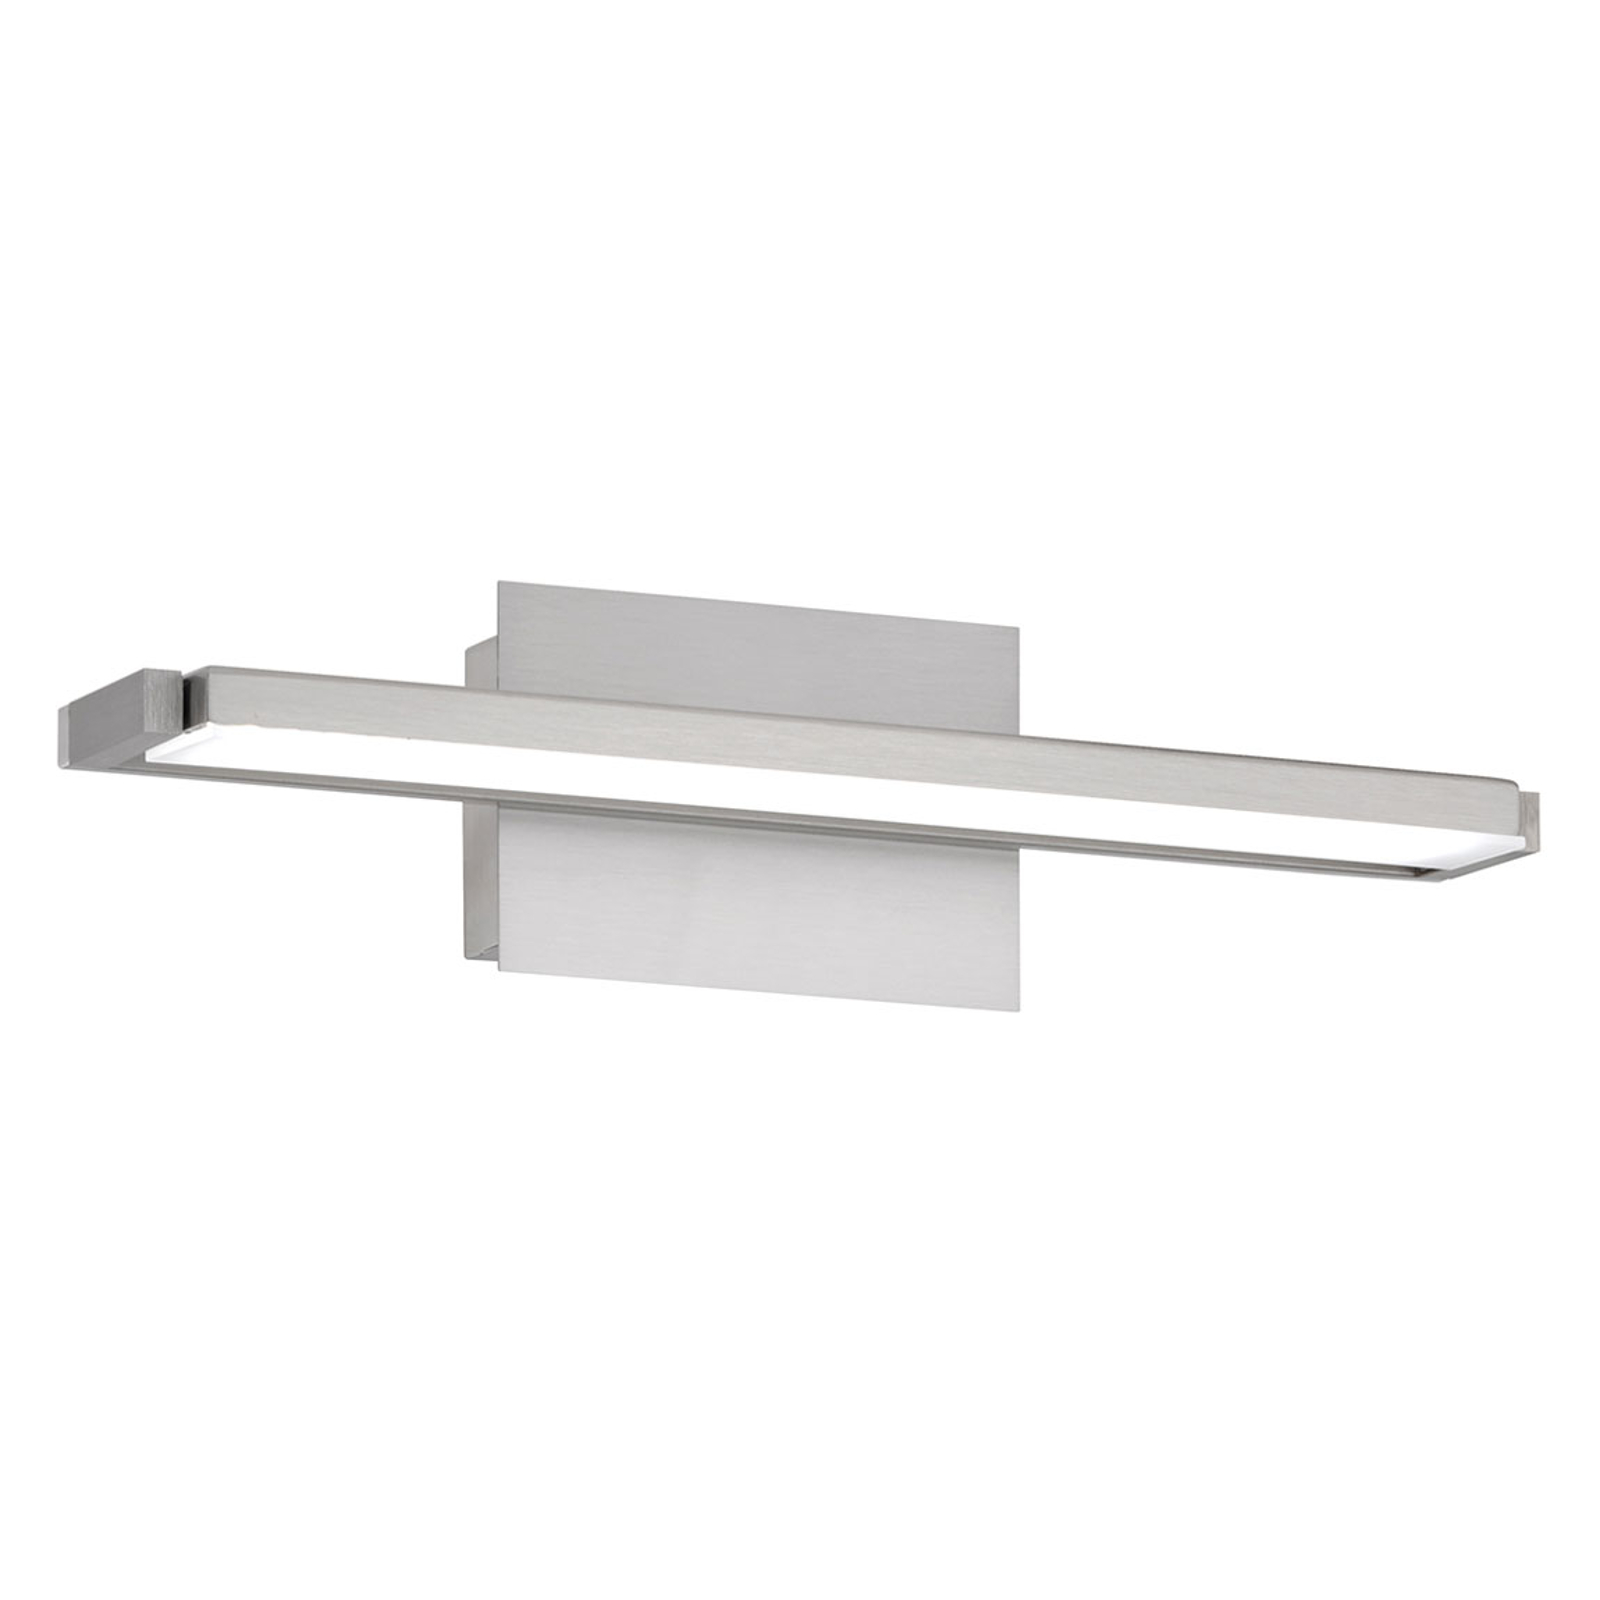 LED wandlamp Pare TW, 3 lichtkl. + dimmer 40 cm